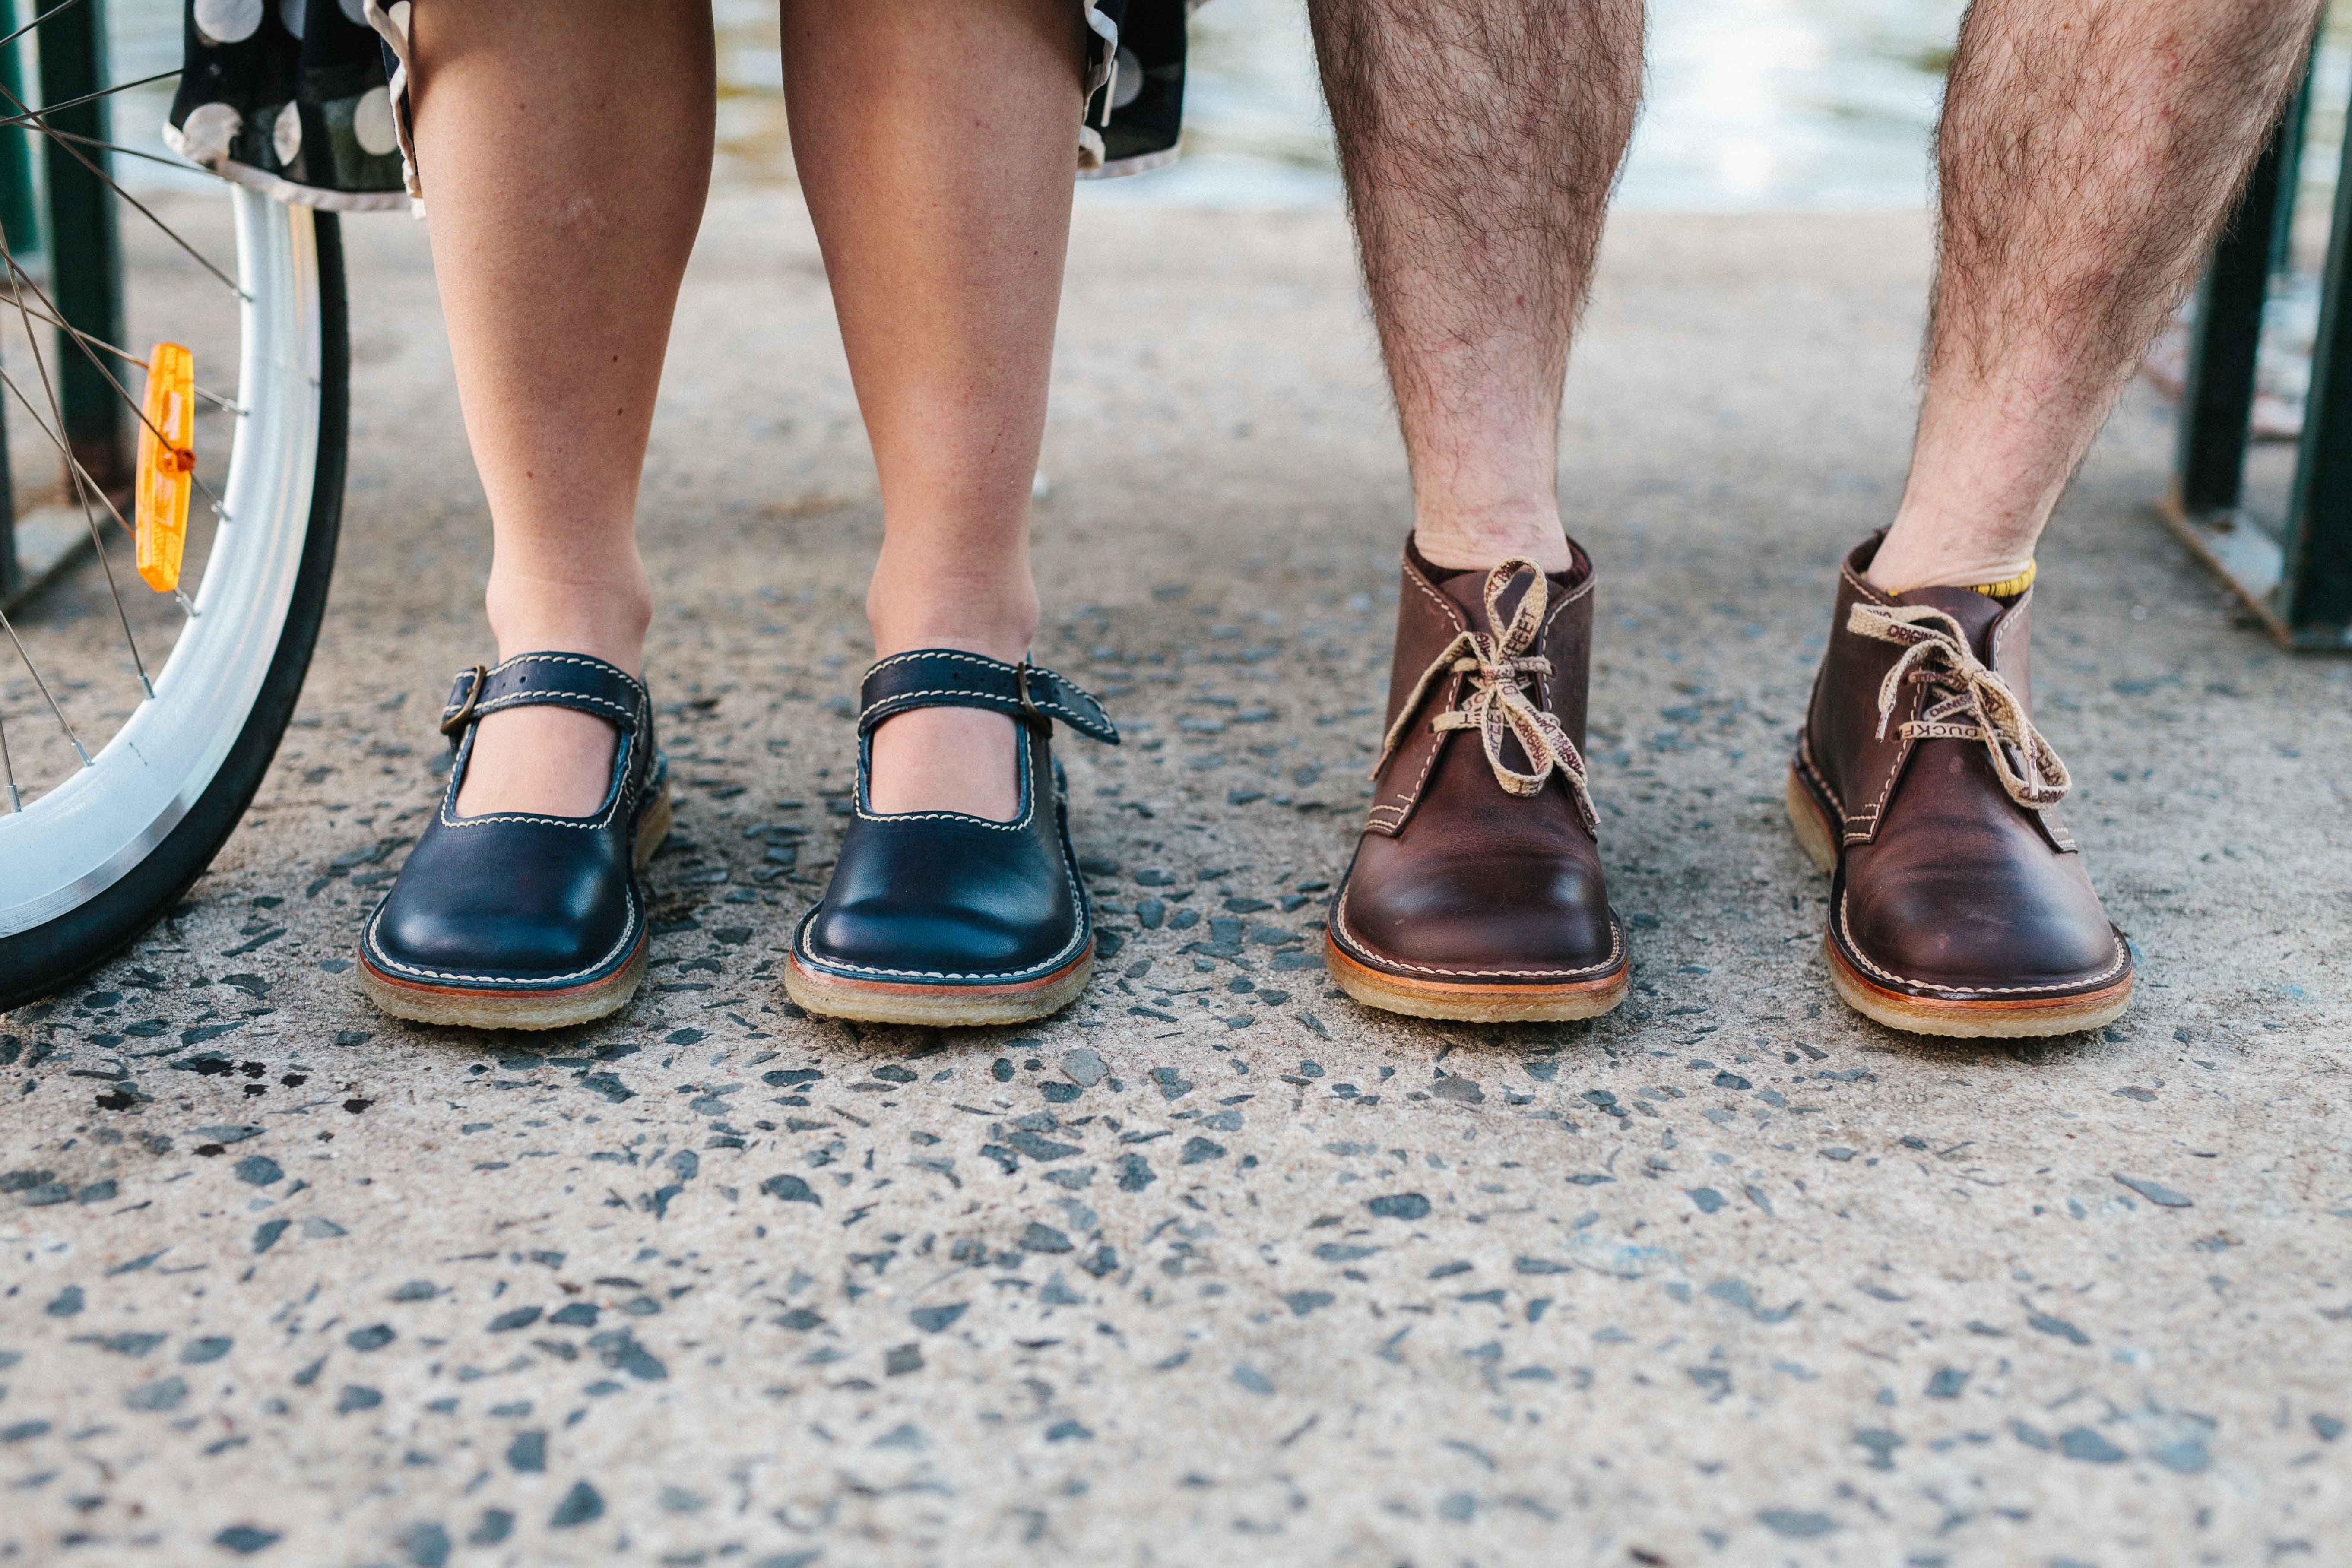 www.duckfeet.com.au | Barefoot shoes